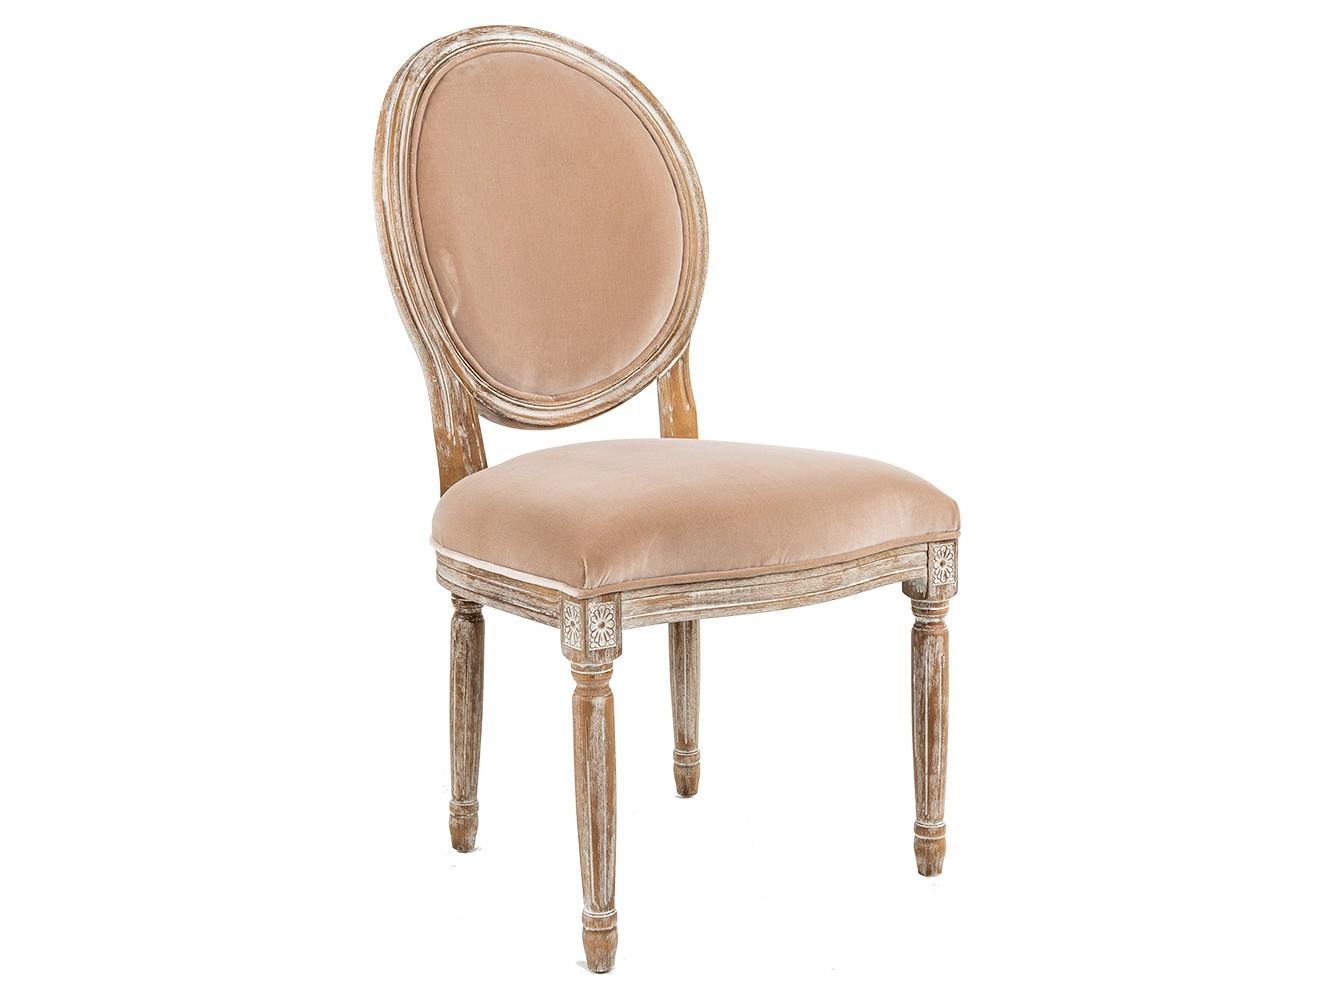 Кухонный стул Object Desire 15438286 от thefurnish